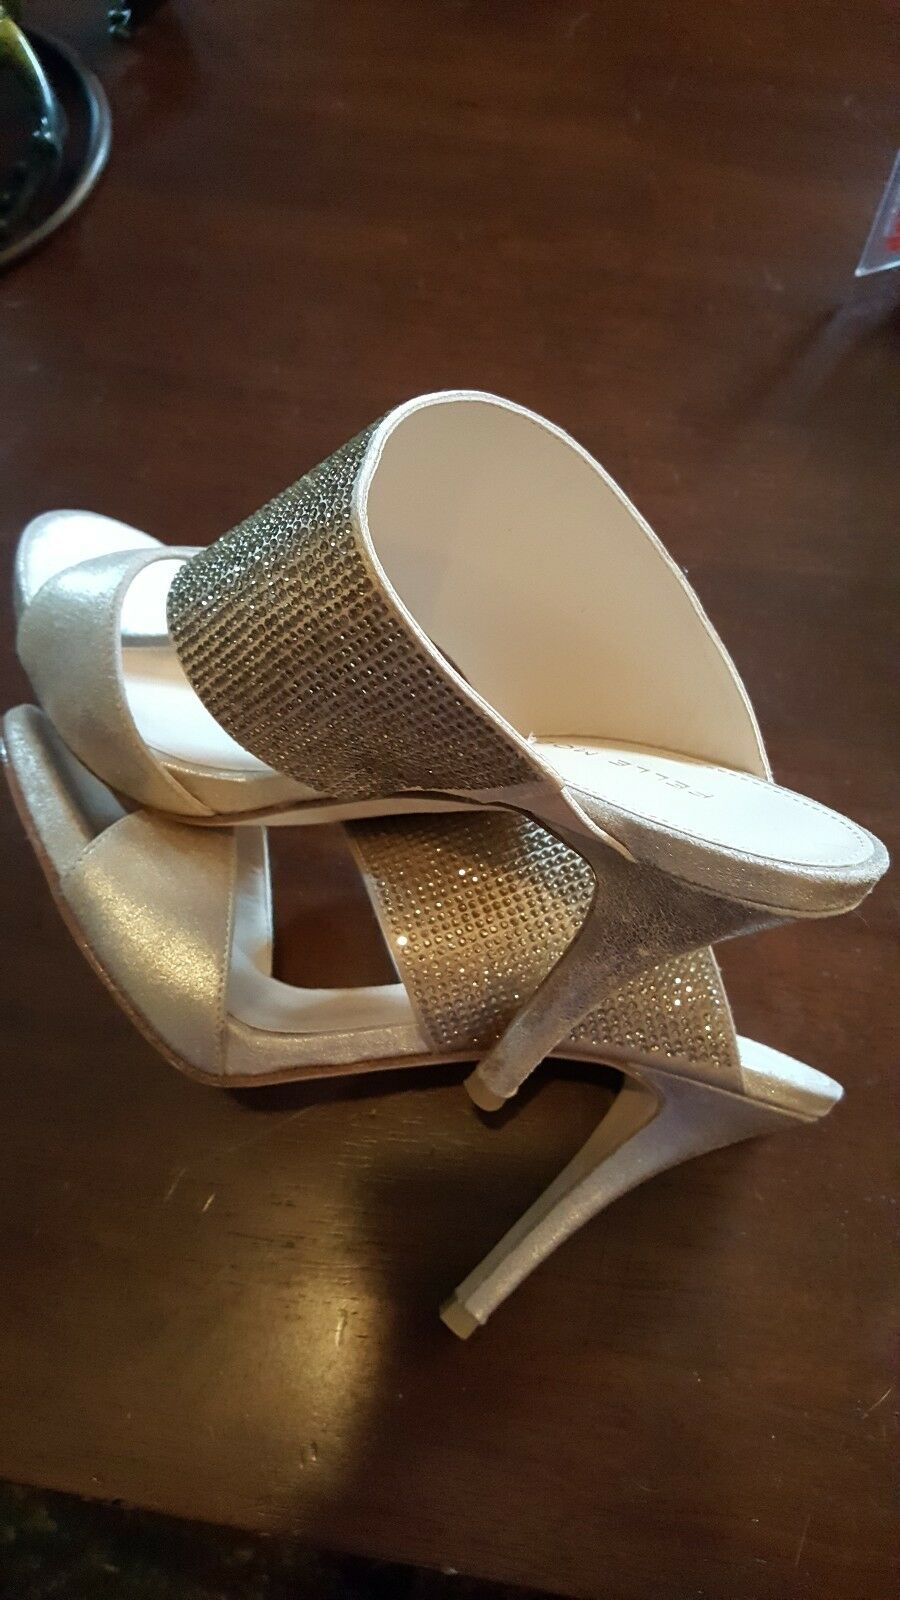 Pelle Moda Gold Glitter Stilettos Damenschuhe Heels Größe Größe Größe 8.5 NEW aaa83e